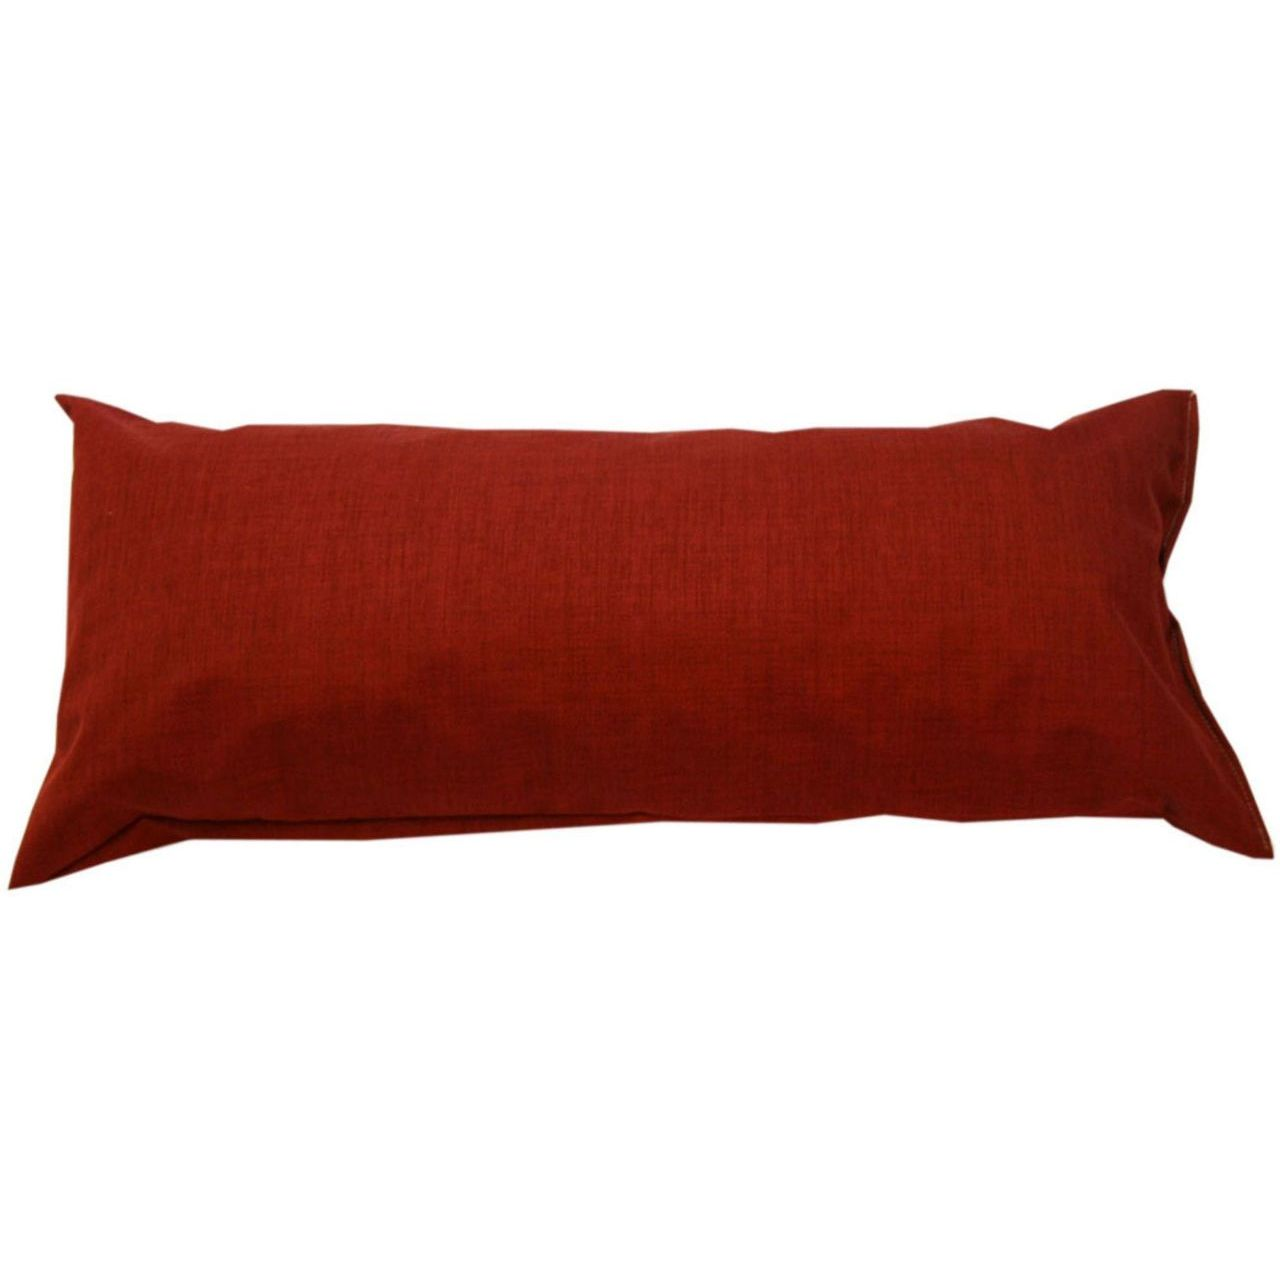 Gleason Deluxe Hammock Pillow - Cherry